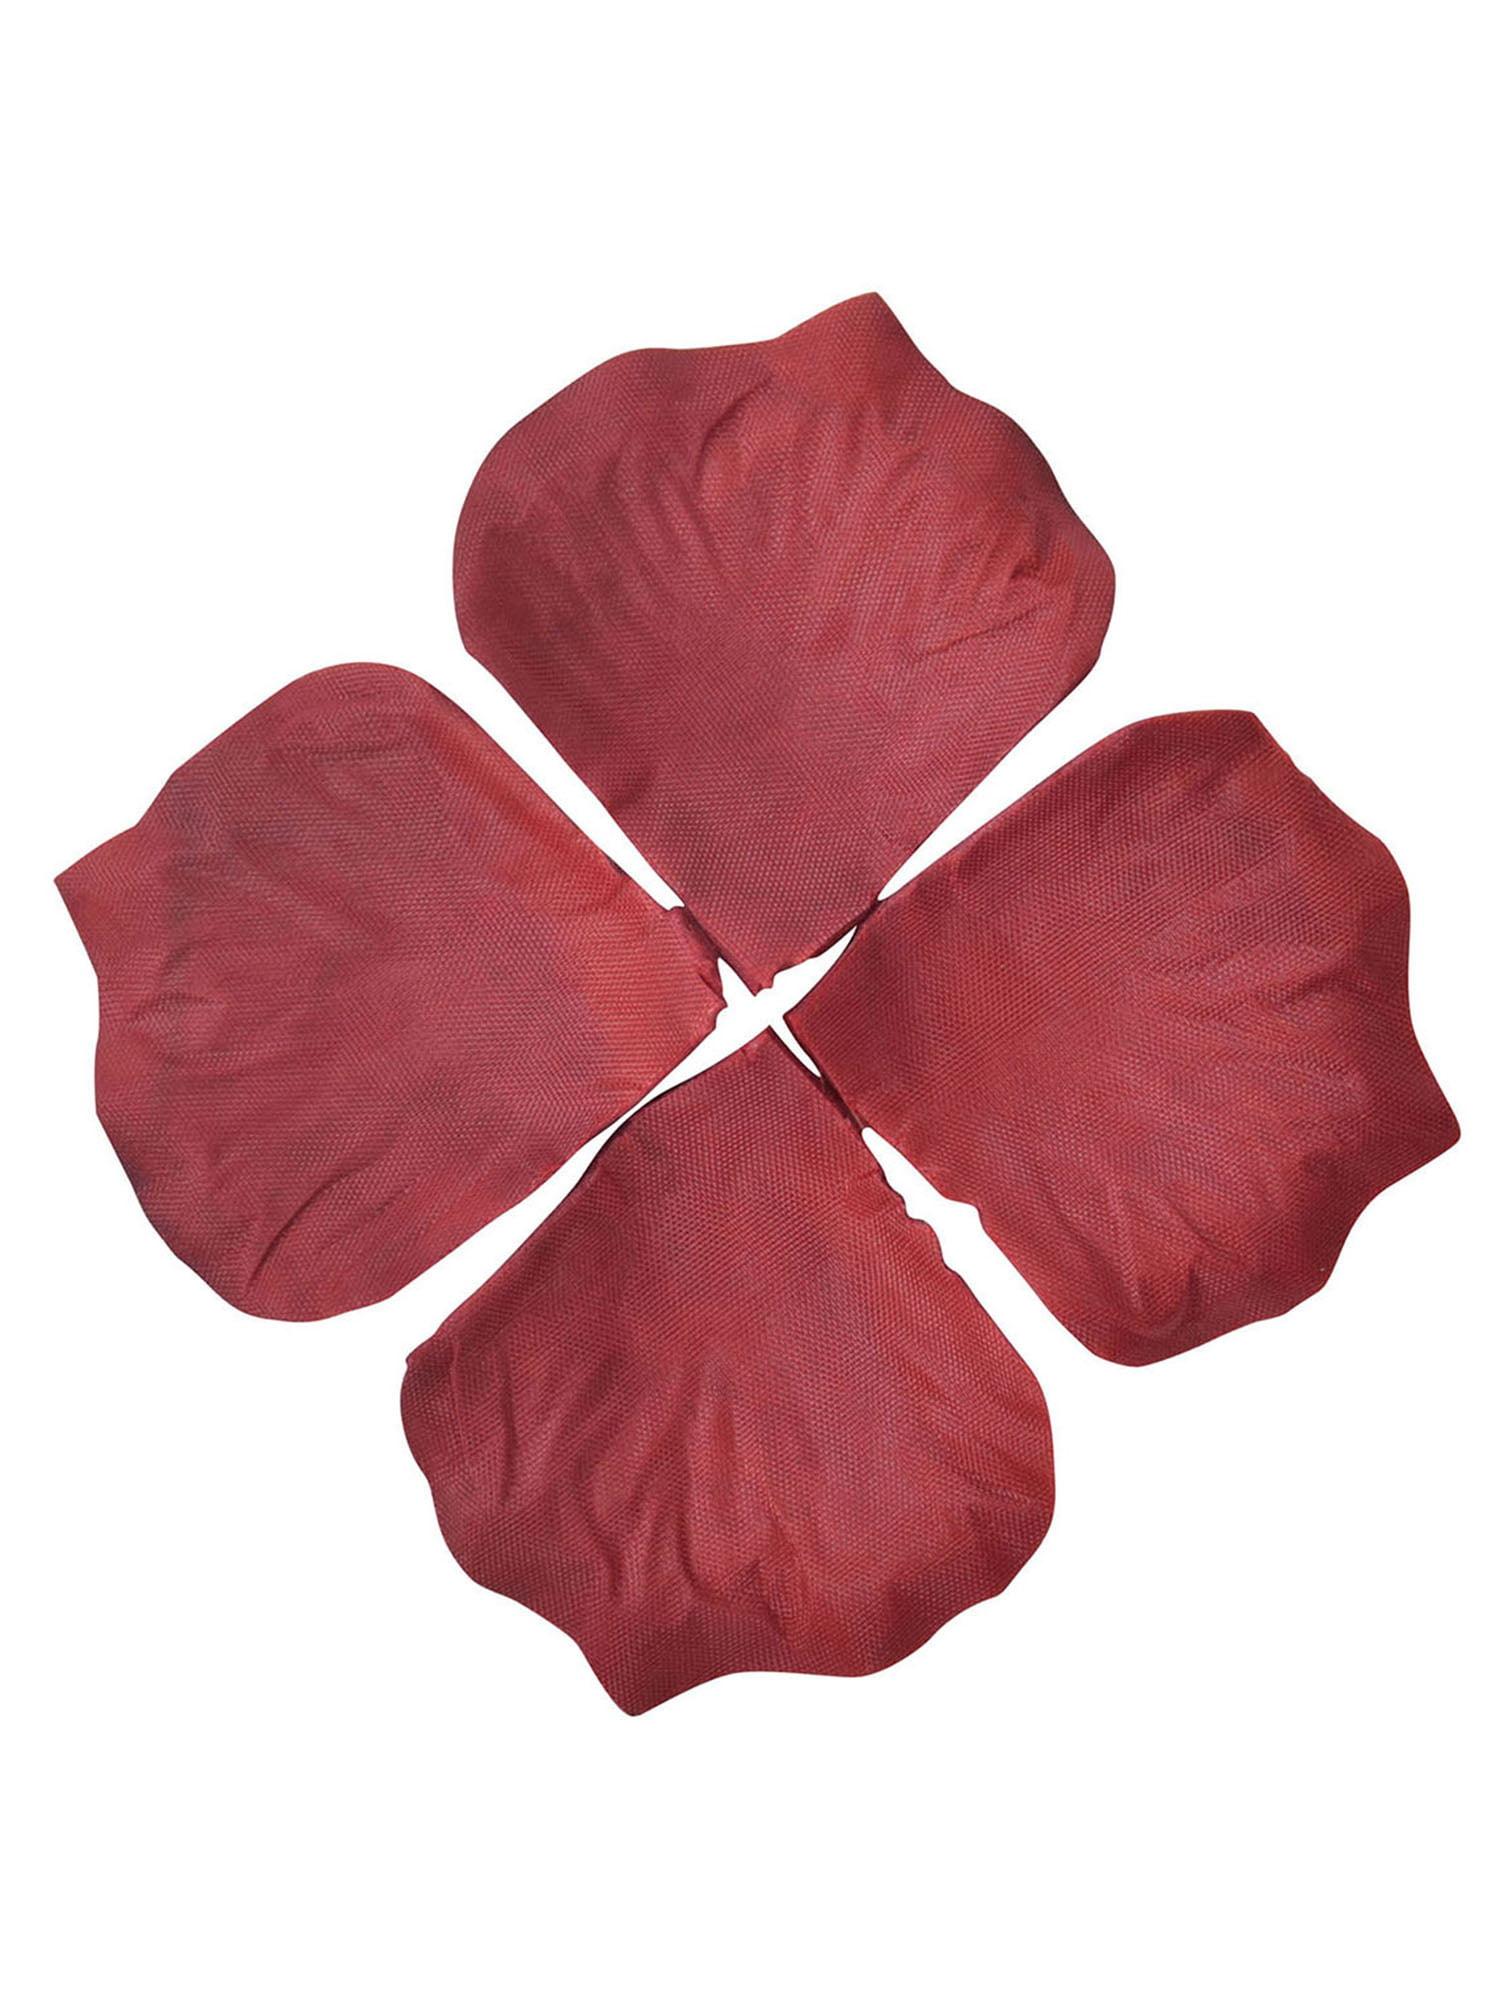 Simplicity 500pcs Silk Flower Rose Petals Wedding Party Decoration ...